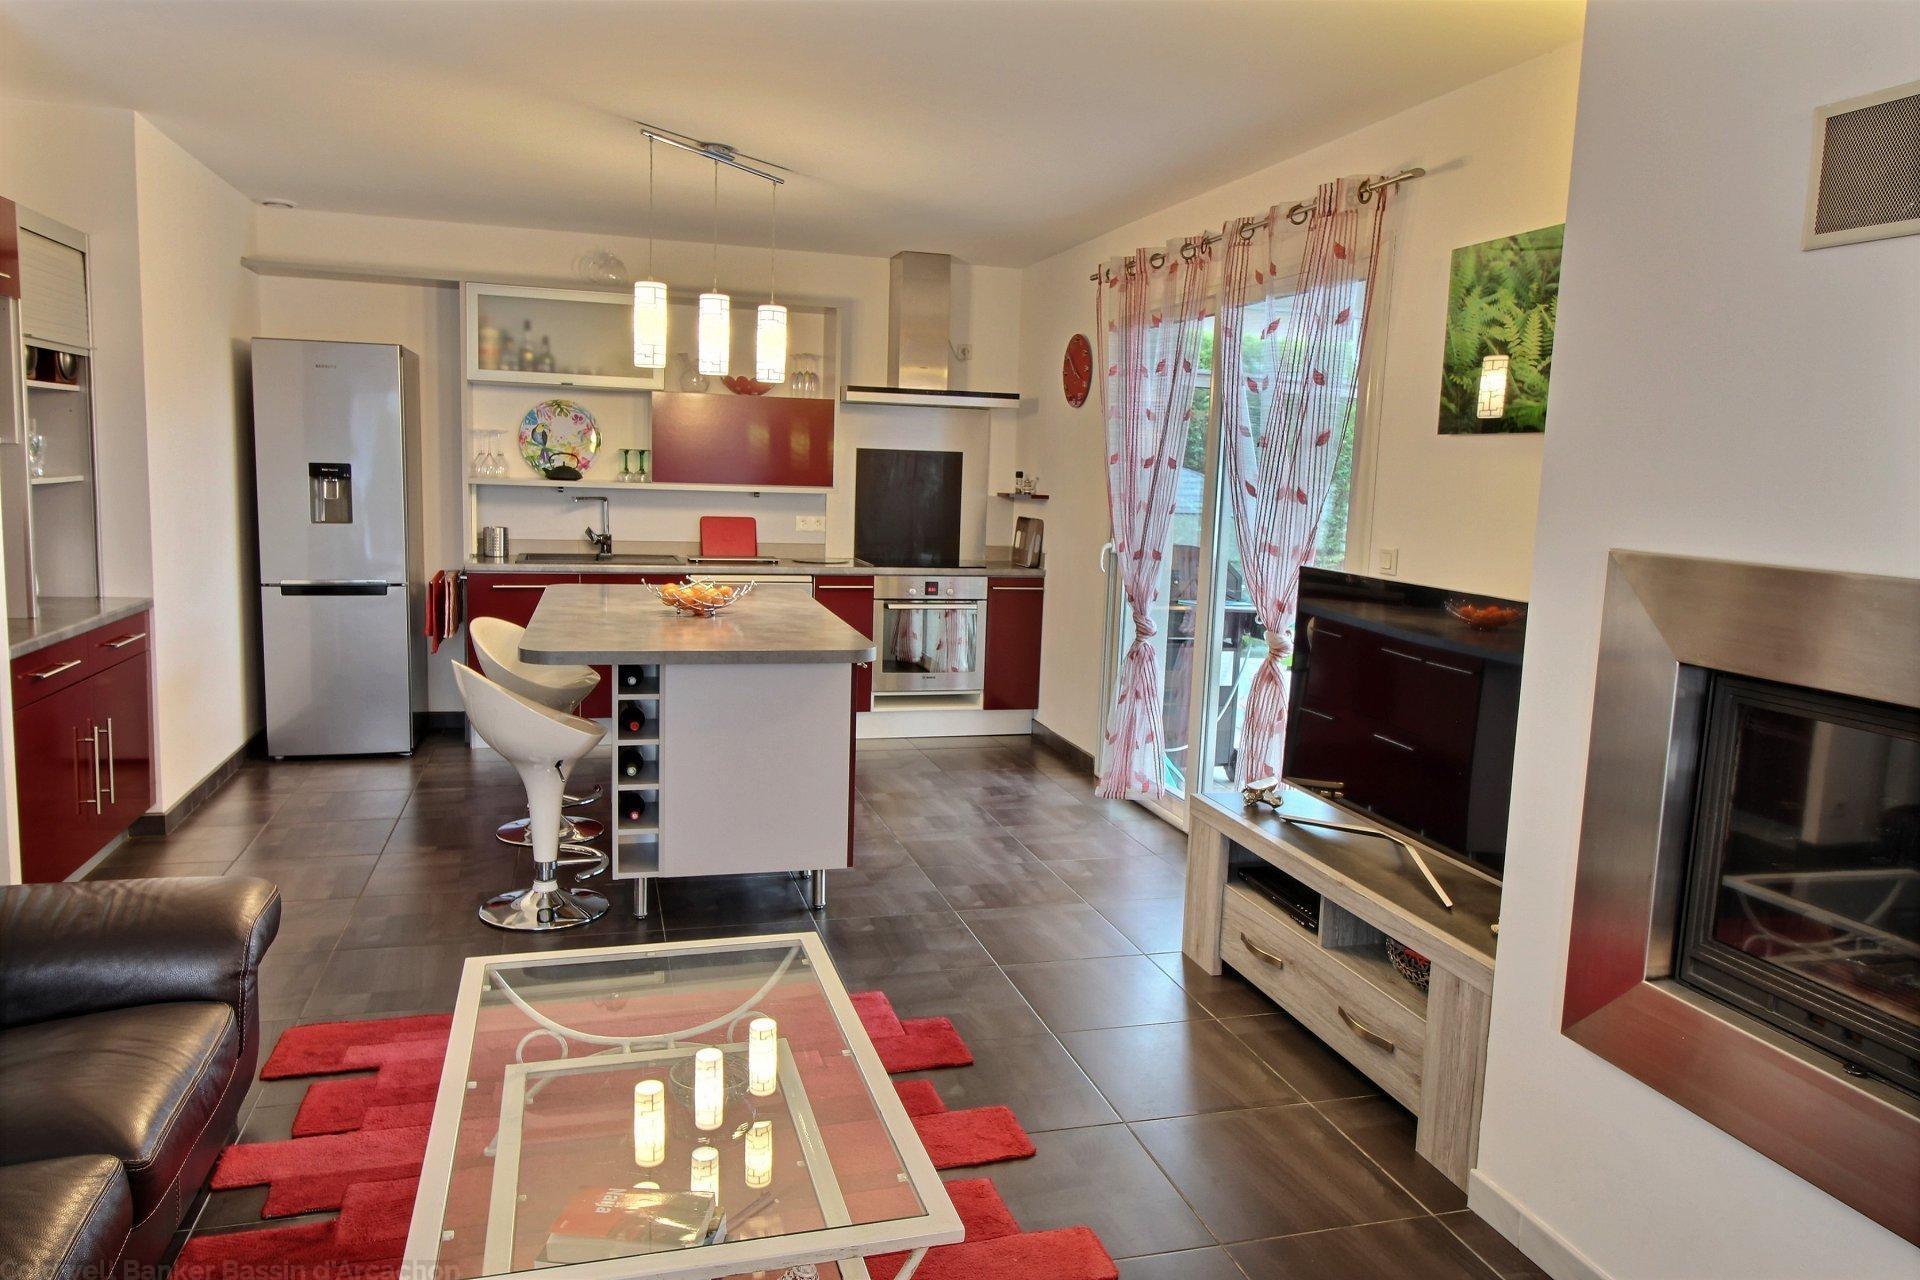 Acheter maison contemporaine 4 chambres bassin d arcachon gujan mestras